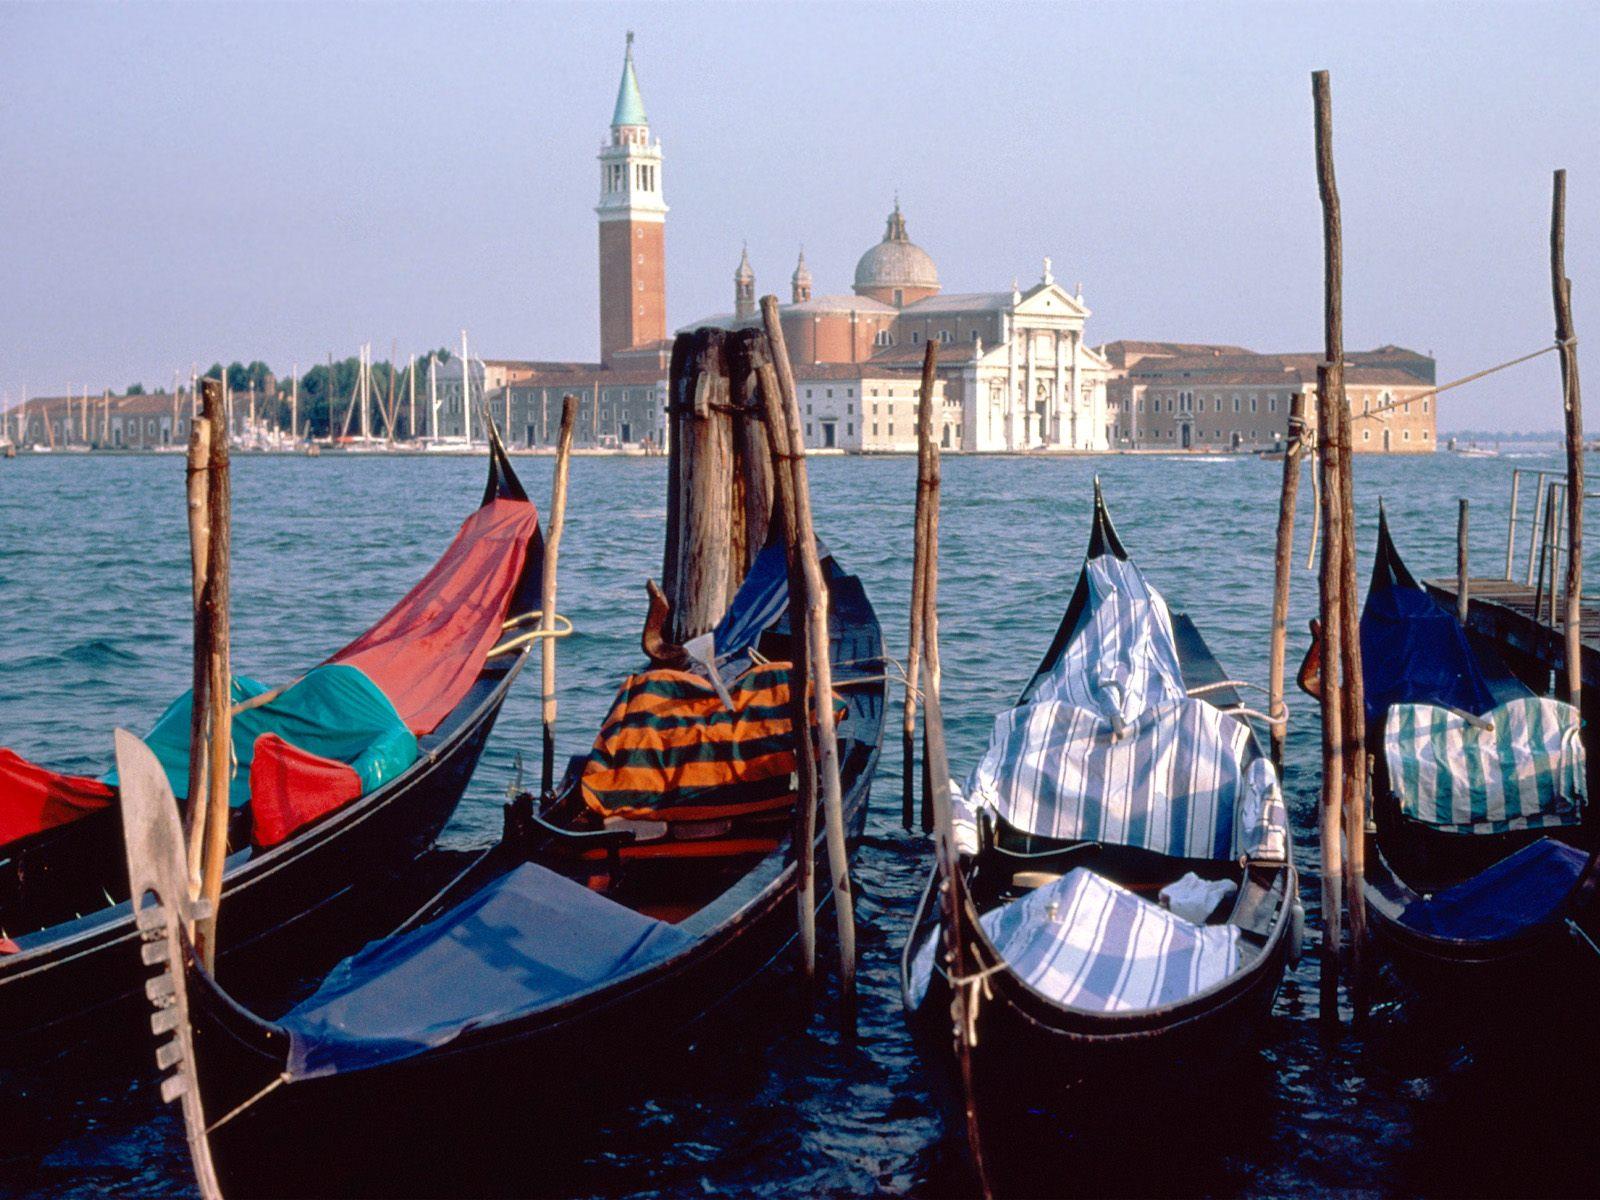 http://3.bp.blogspot.com/-C37bHfVpO6s/Tcp5J4eifQI/AAAAAAAACYo/1RjB_Fedv4I/s1600/Venice%252C+Italy.jpg